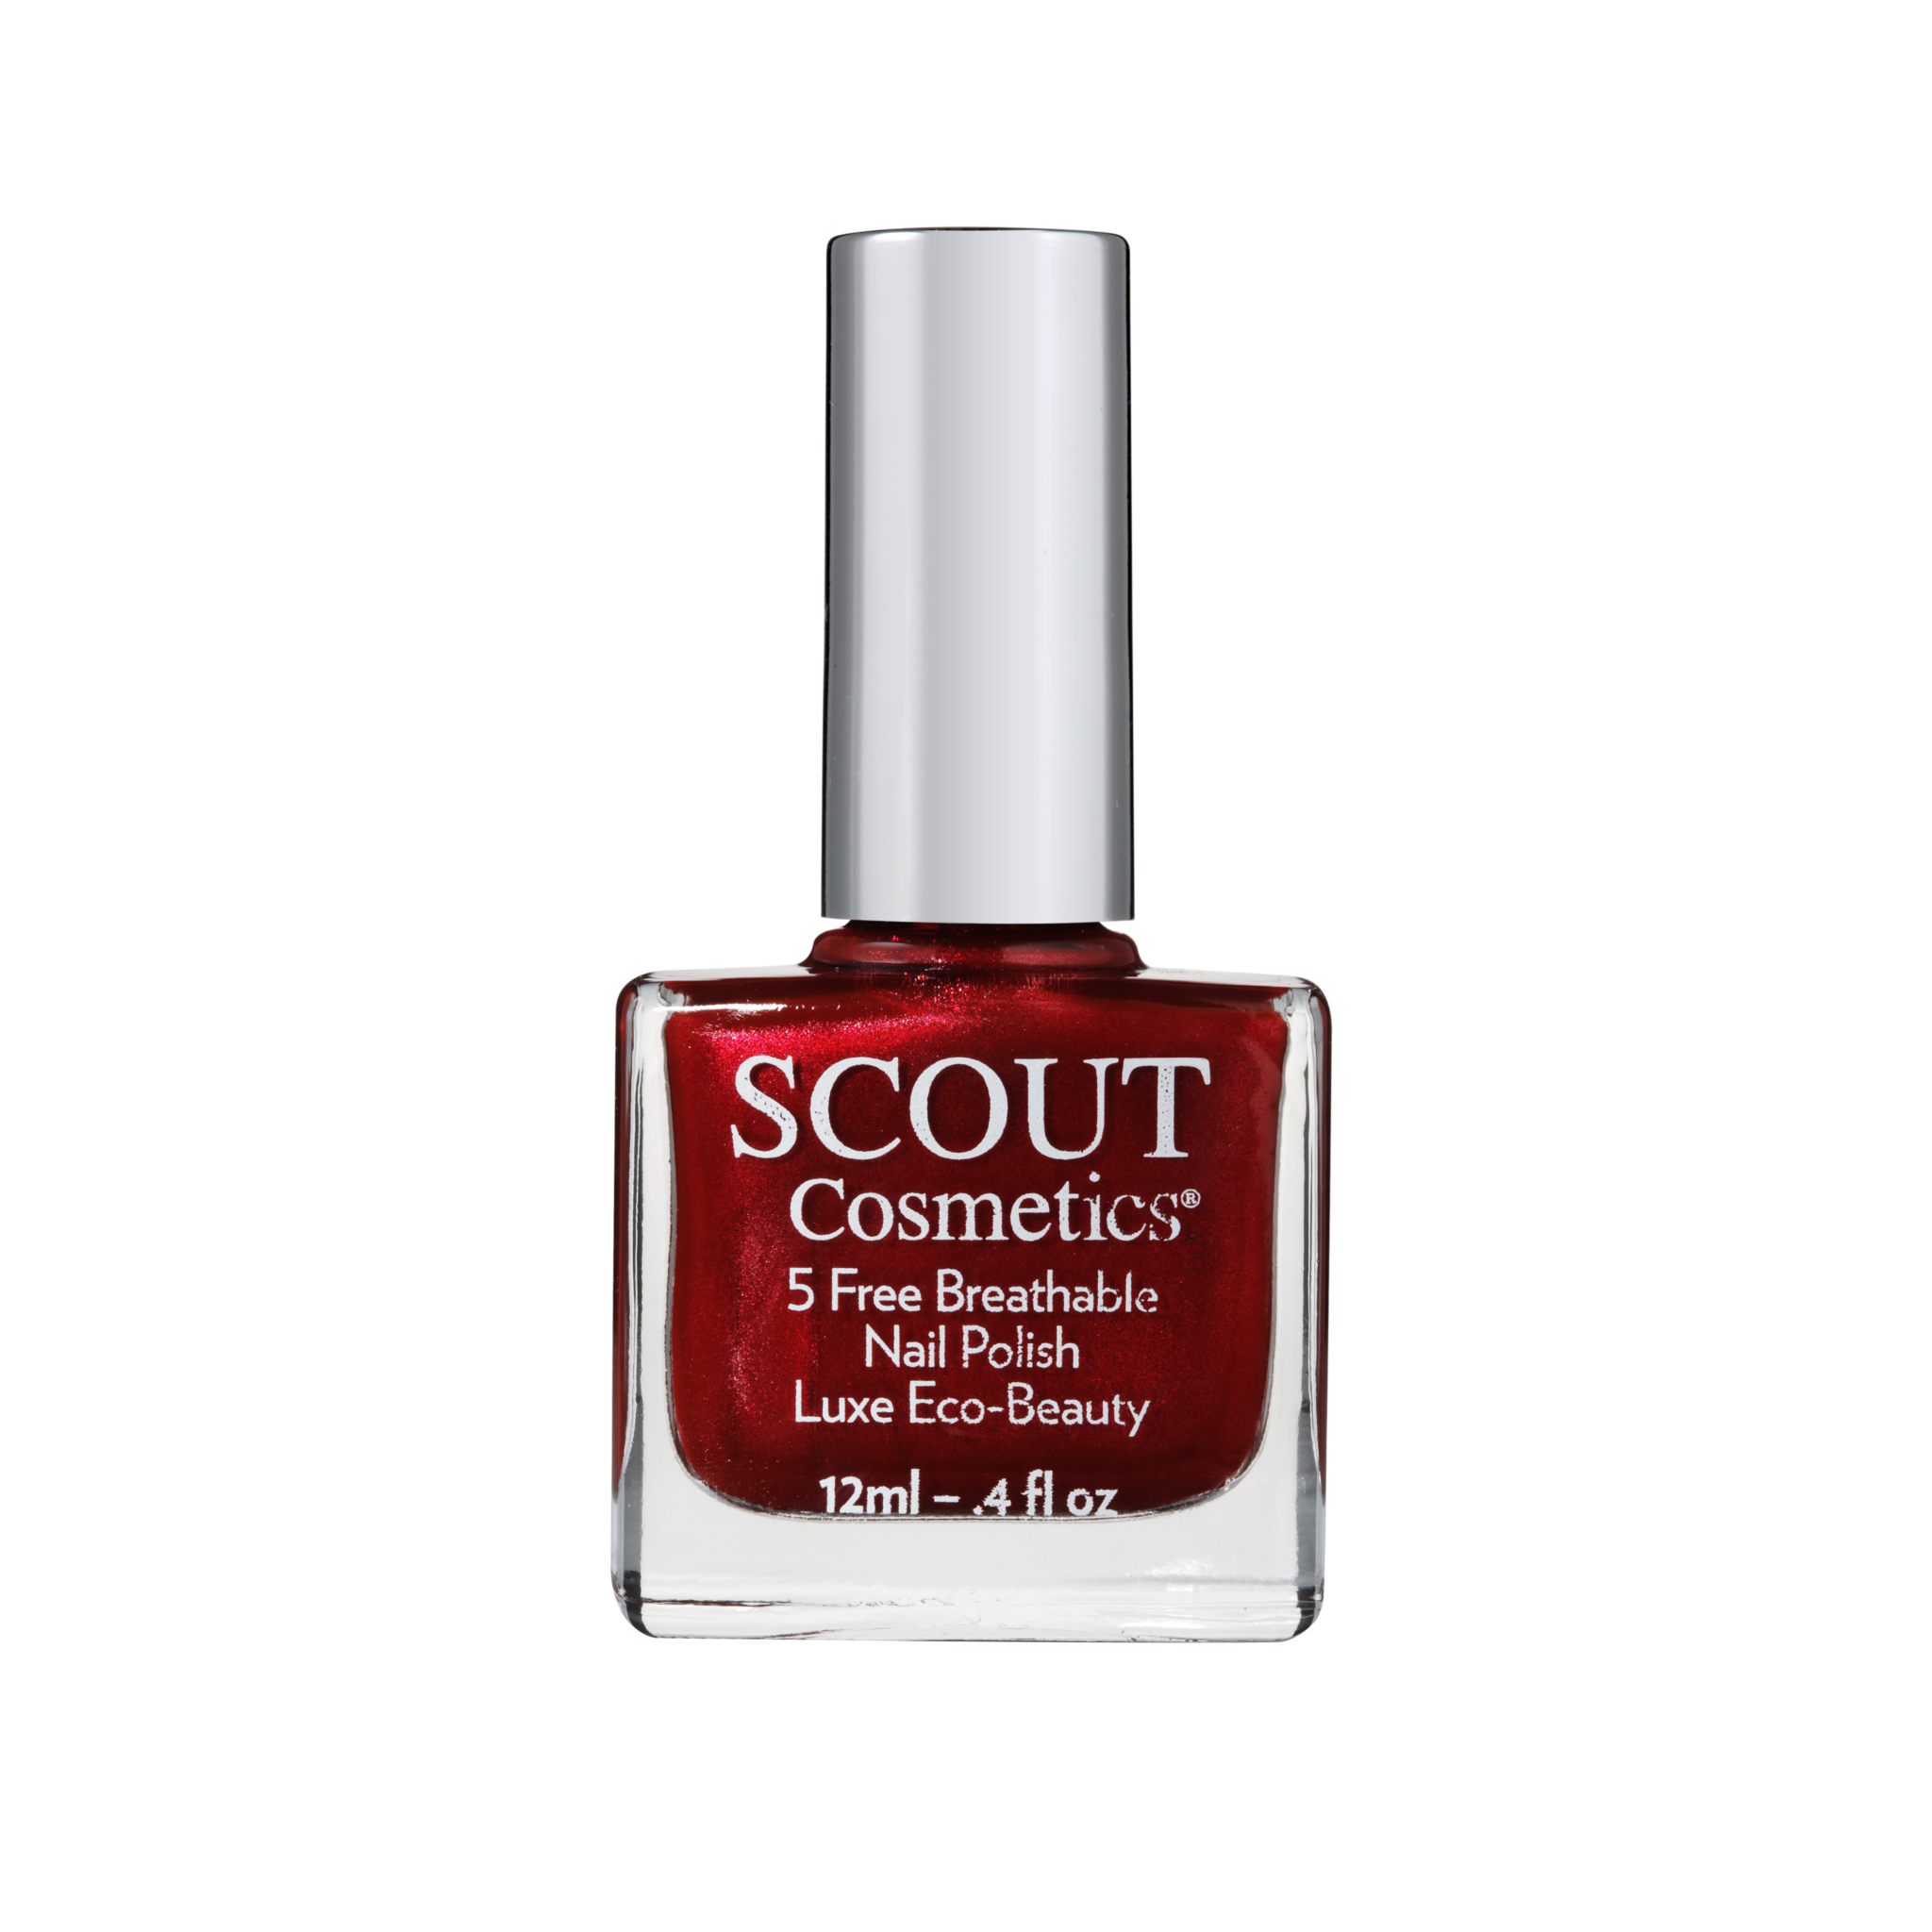 SCOUT Cosmetics Nail Polish - Shake It SCO010   Hardy\'s   New Zealand